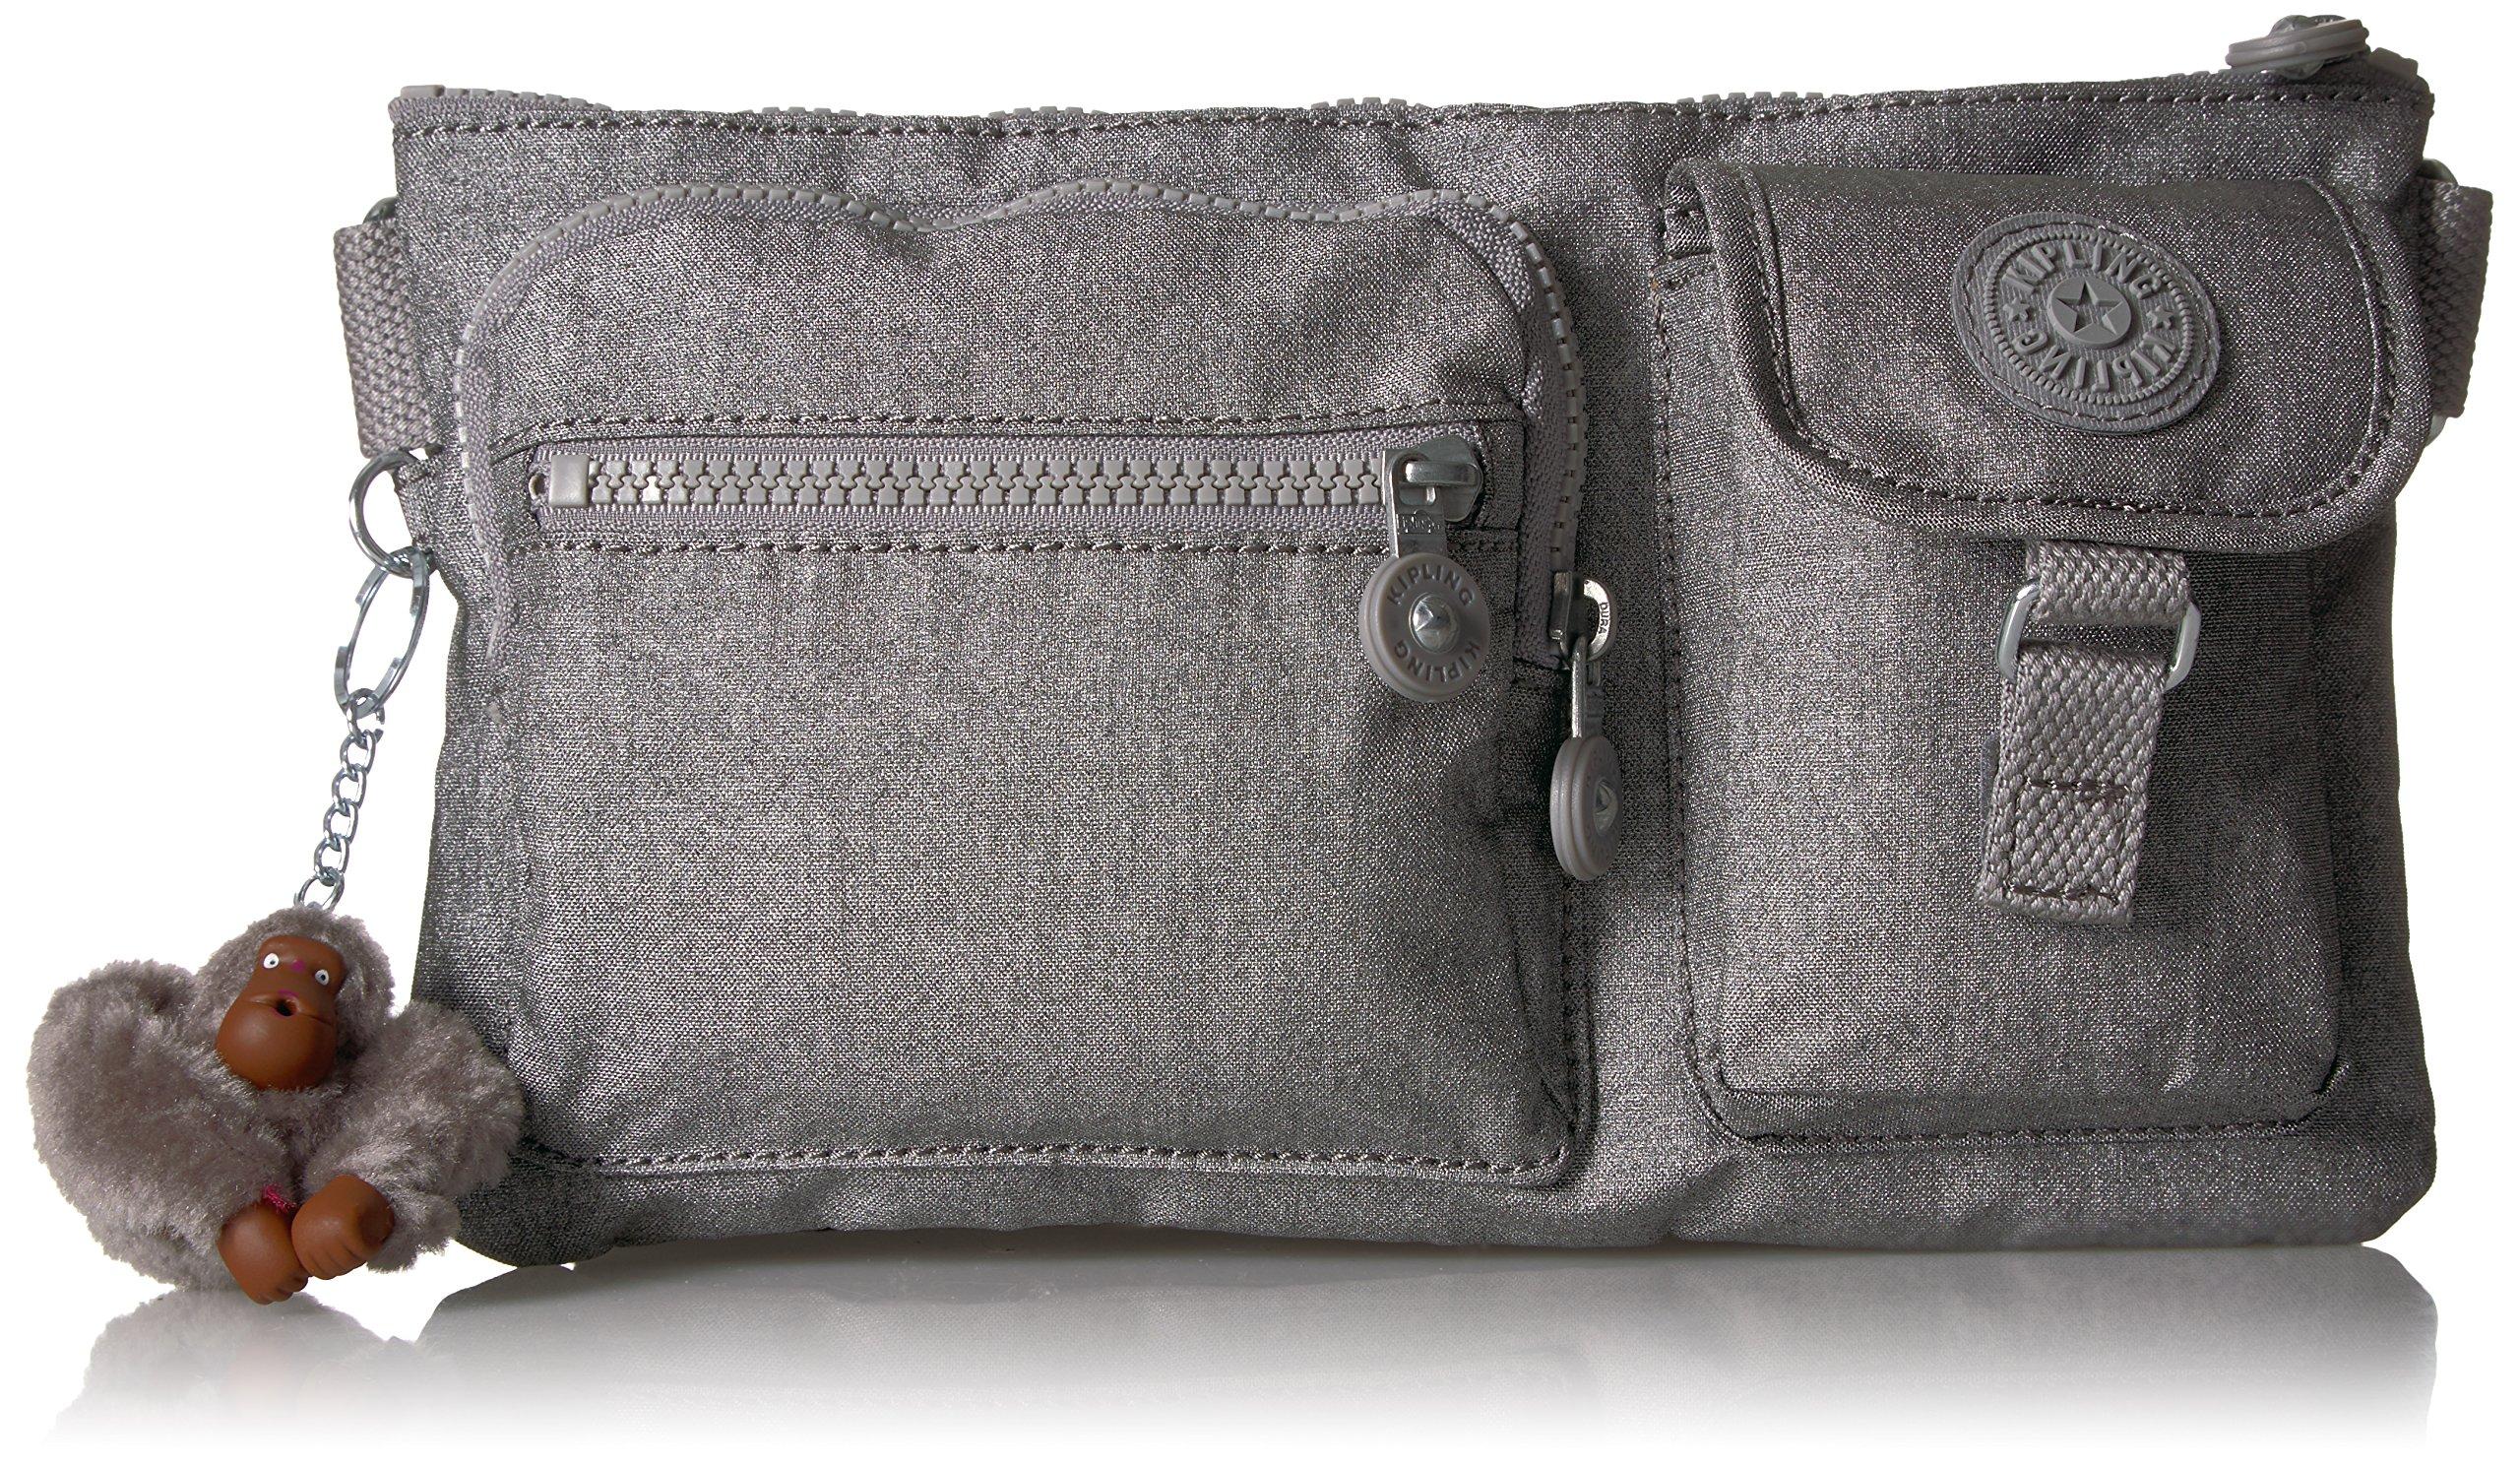 Kipling Women's Presto Metallic Convertible Waistpack